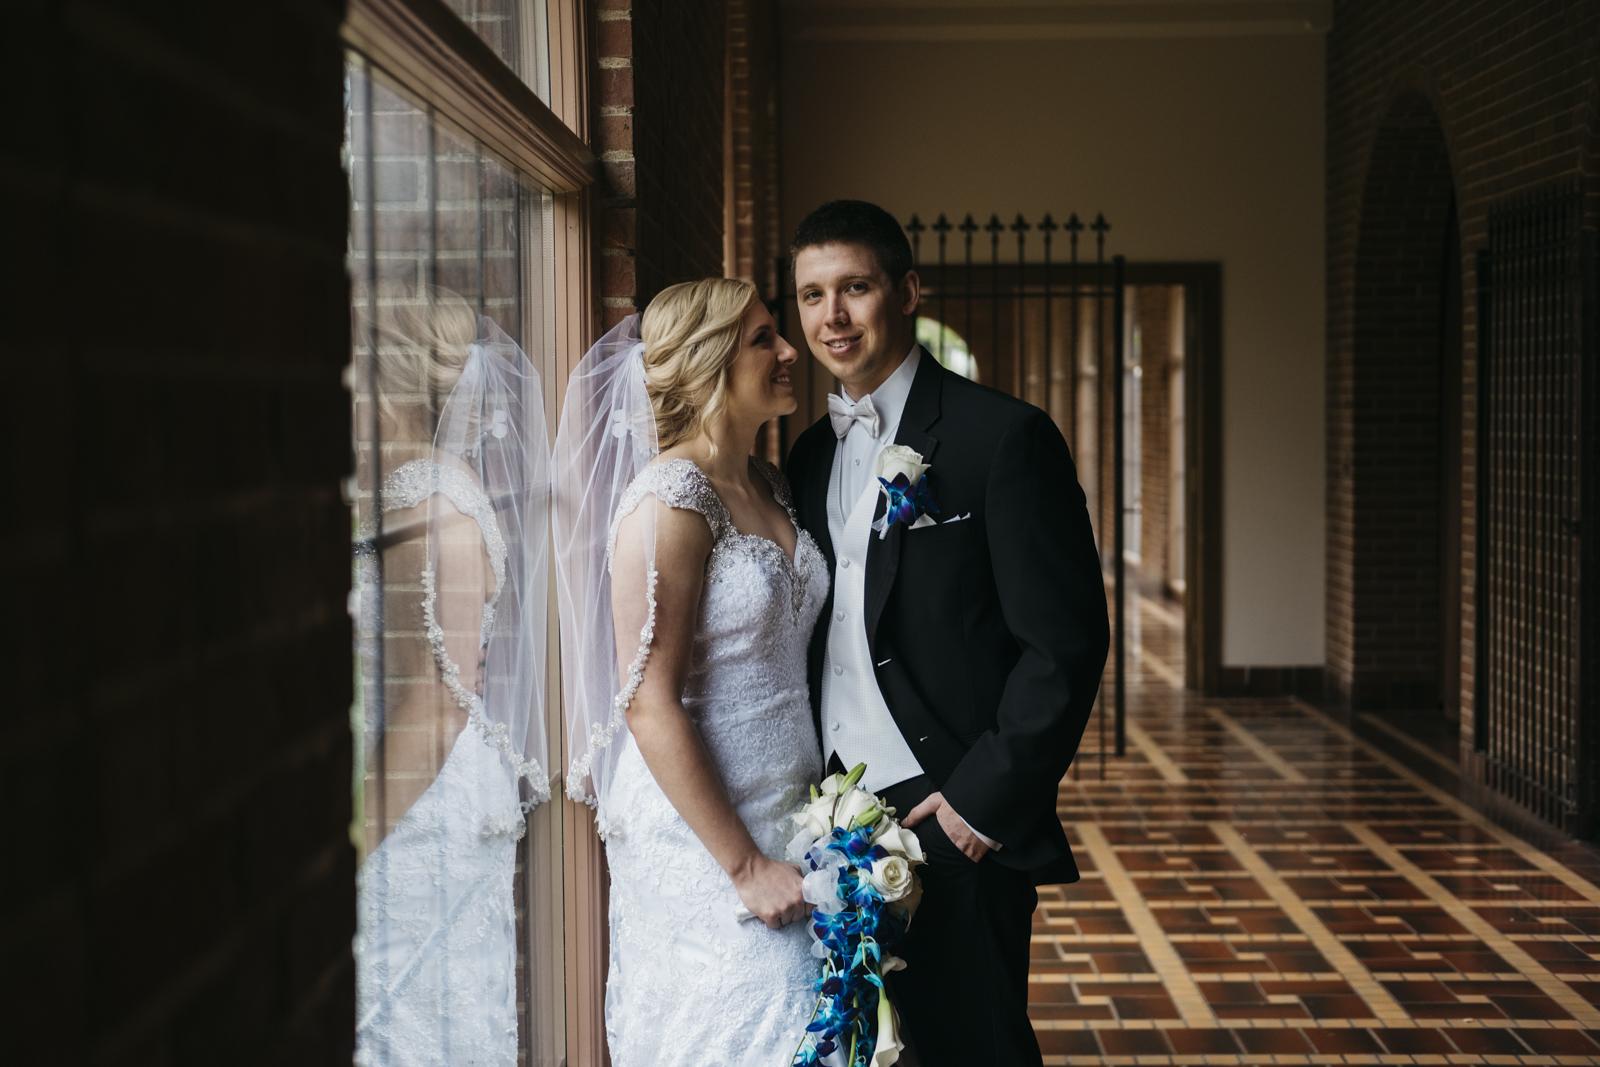 Wedding photography at The Inn at St. John's.